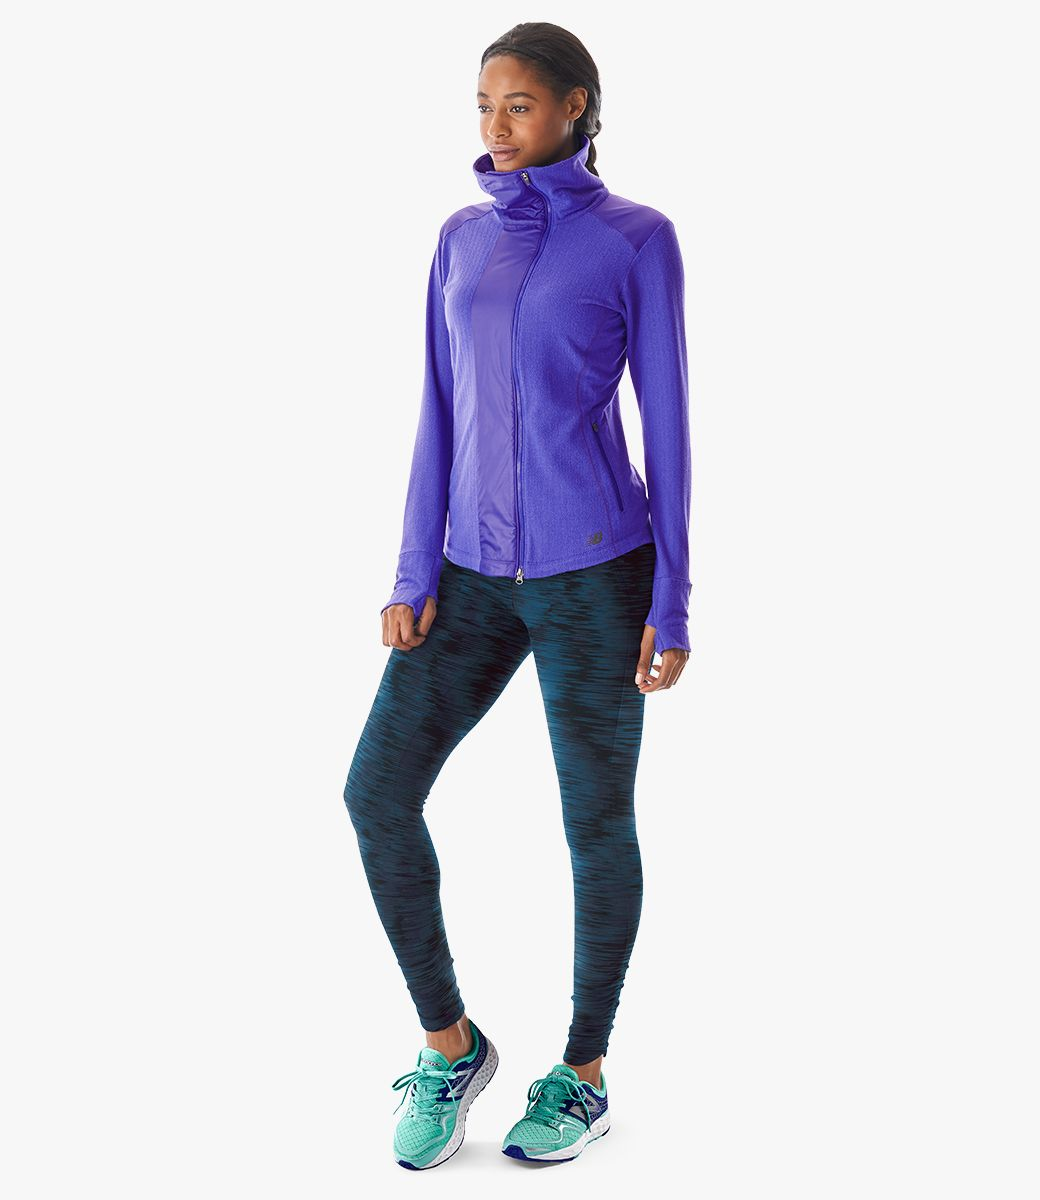 New Balance Womens Vongo and Novelty Heat,